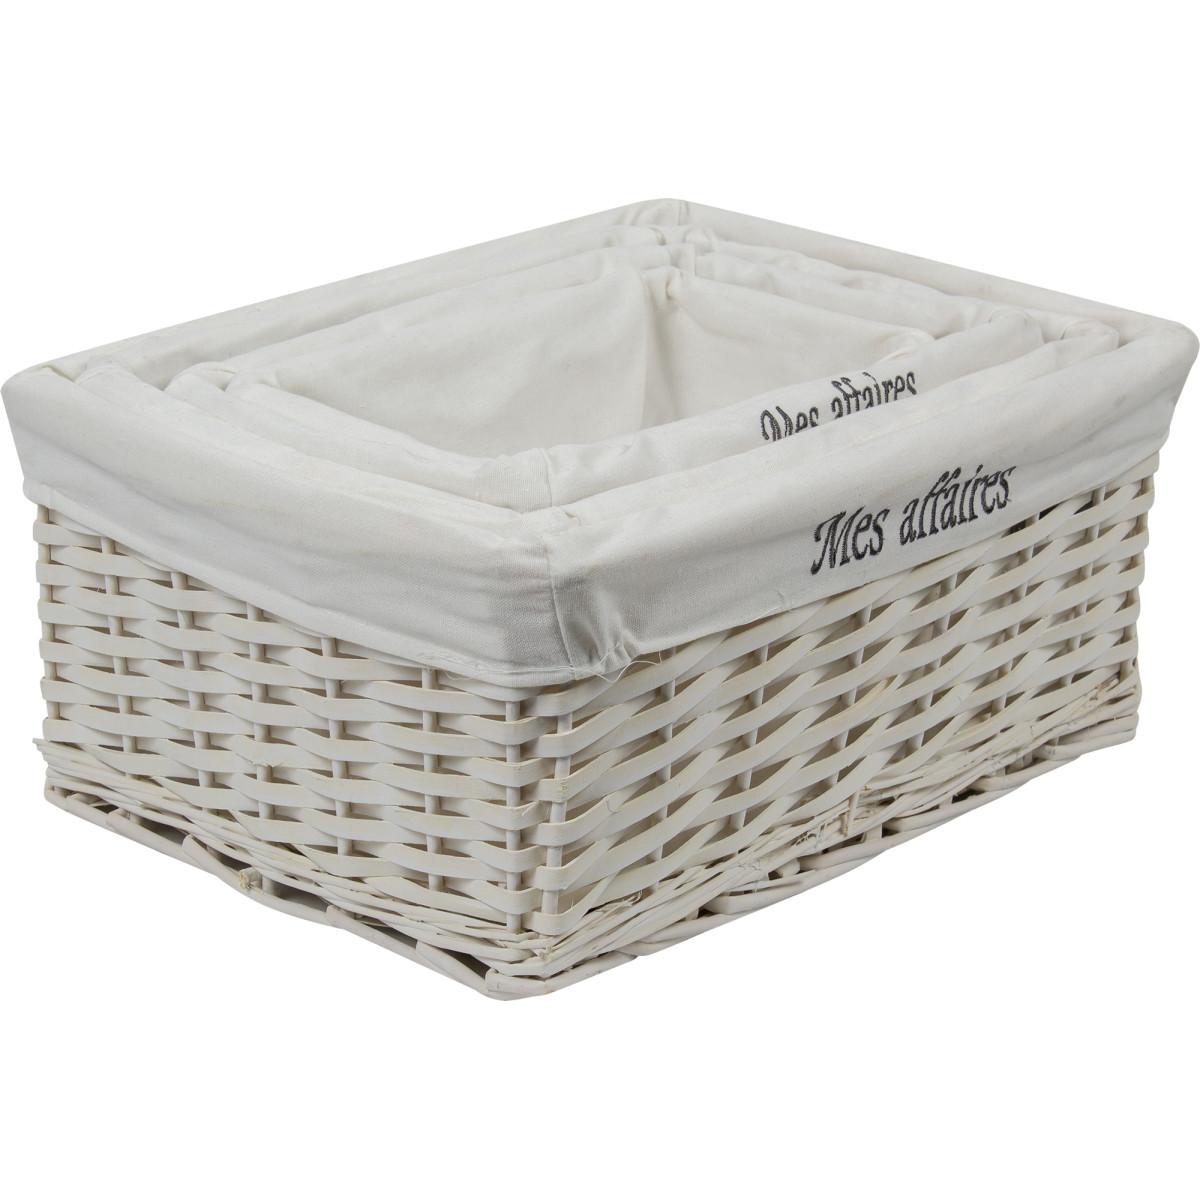 Комплект из 4 плетенных корзин белые